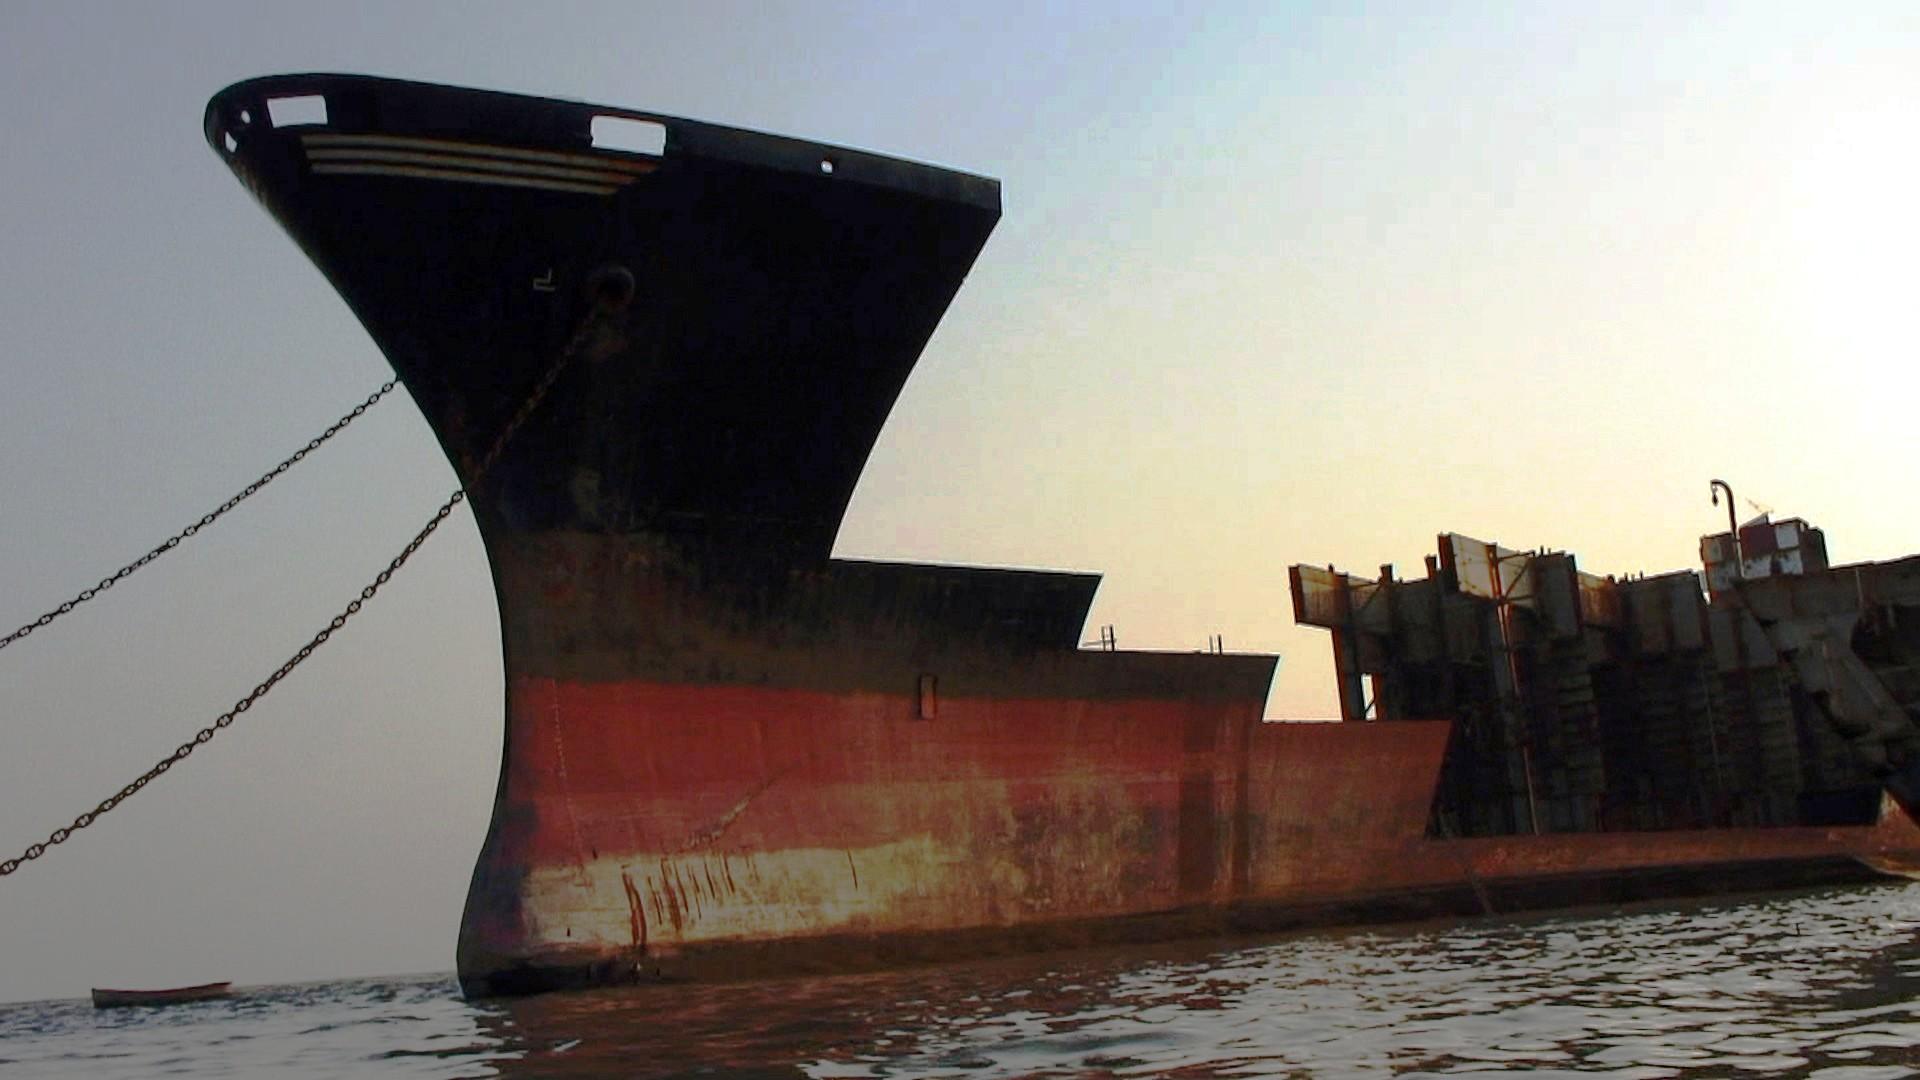 800px-Jafrabad_Chittagong_shipbreaking_(6)